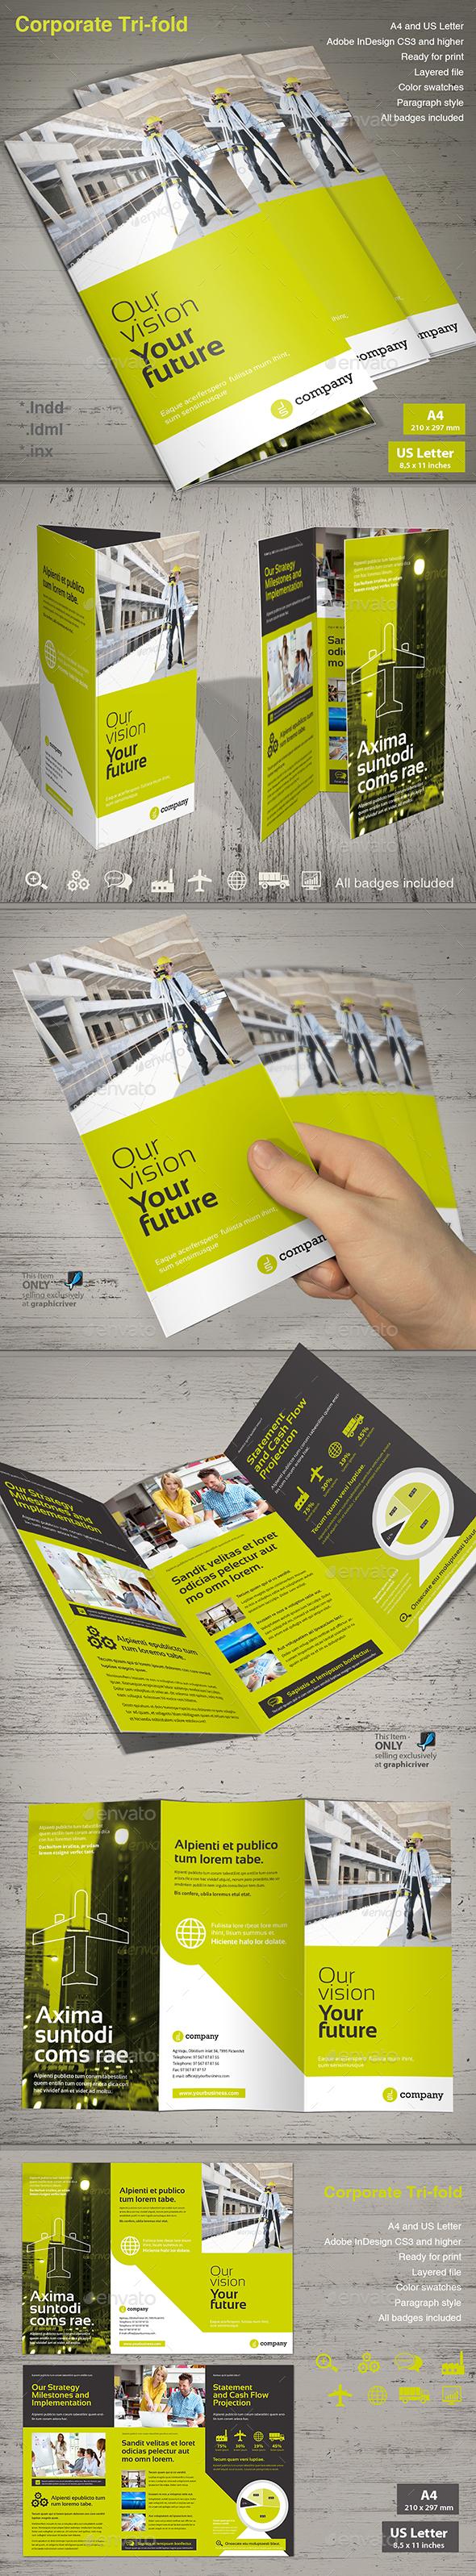 Corporate Tri-fold Vol. 3 - Corporate Brochures